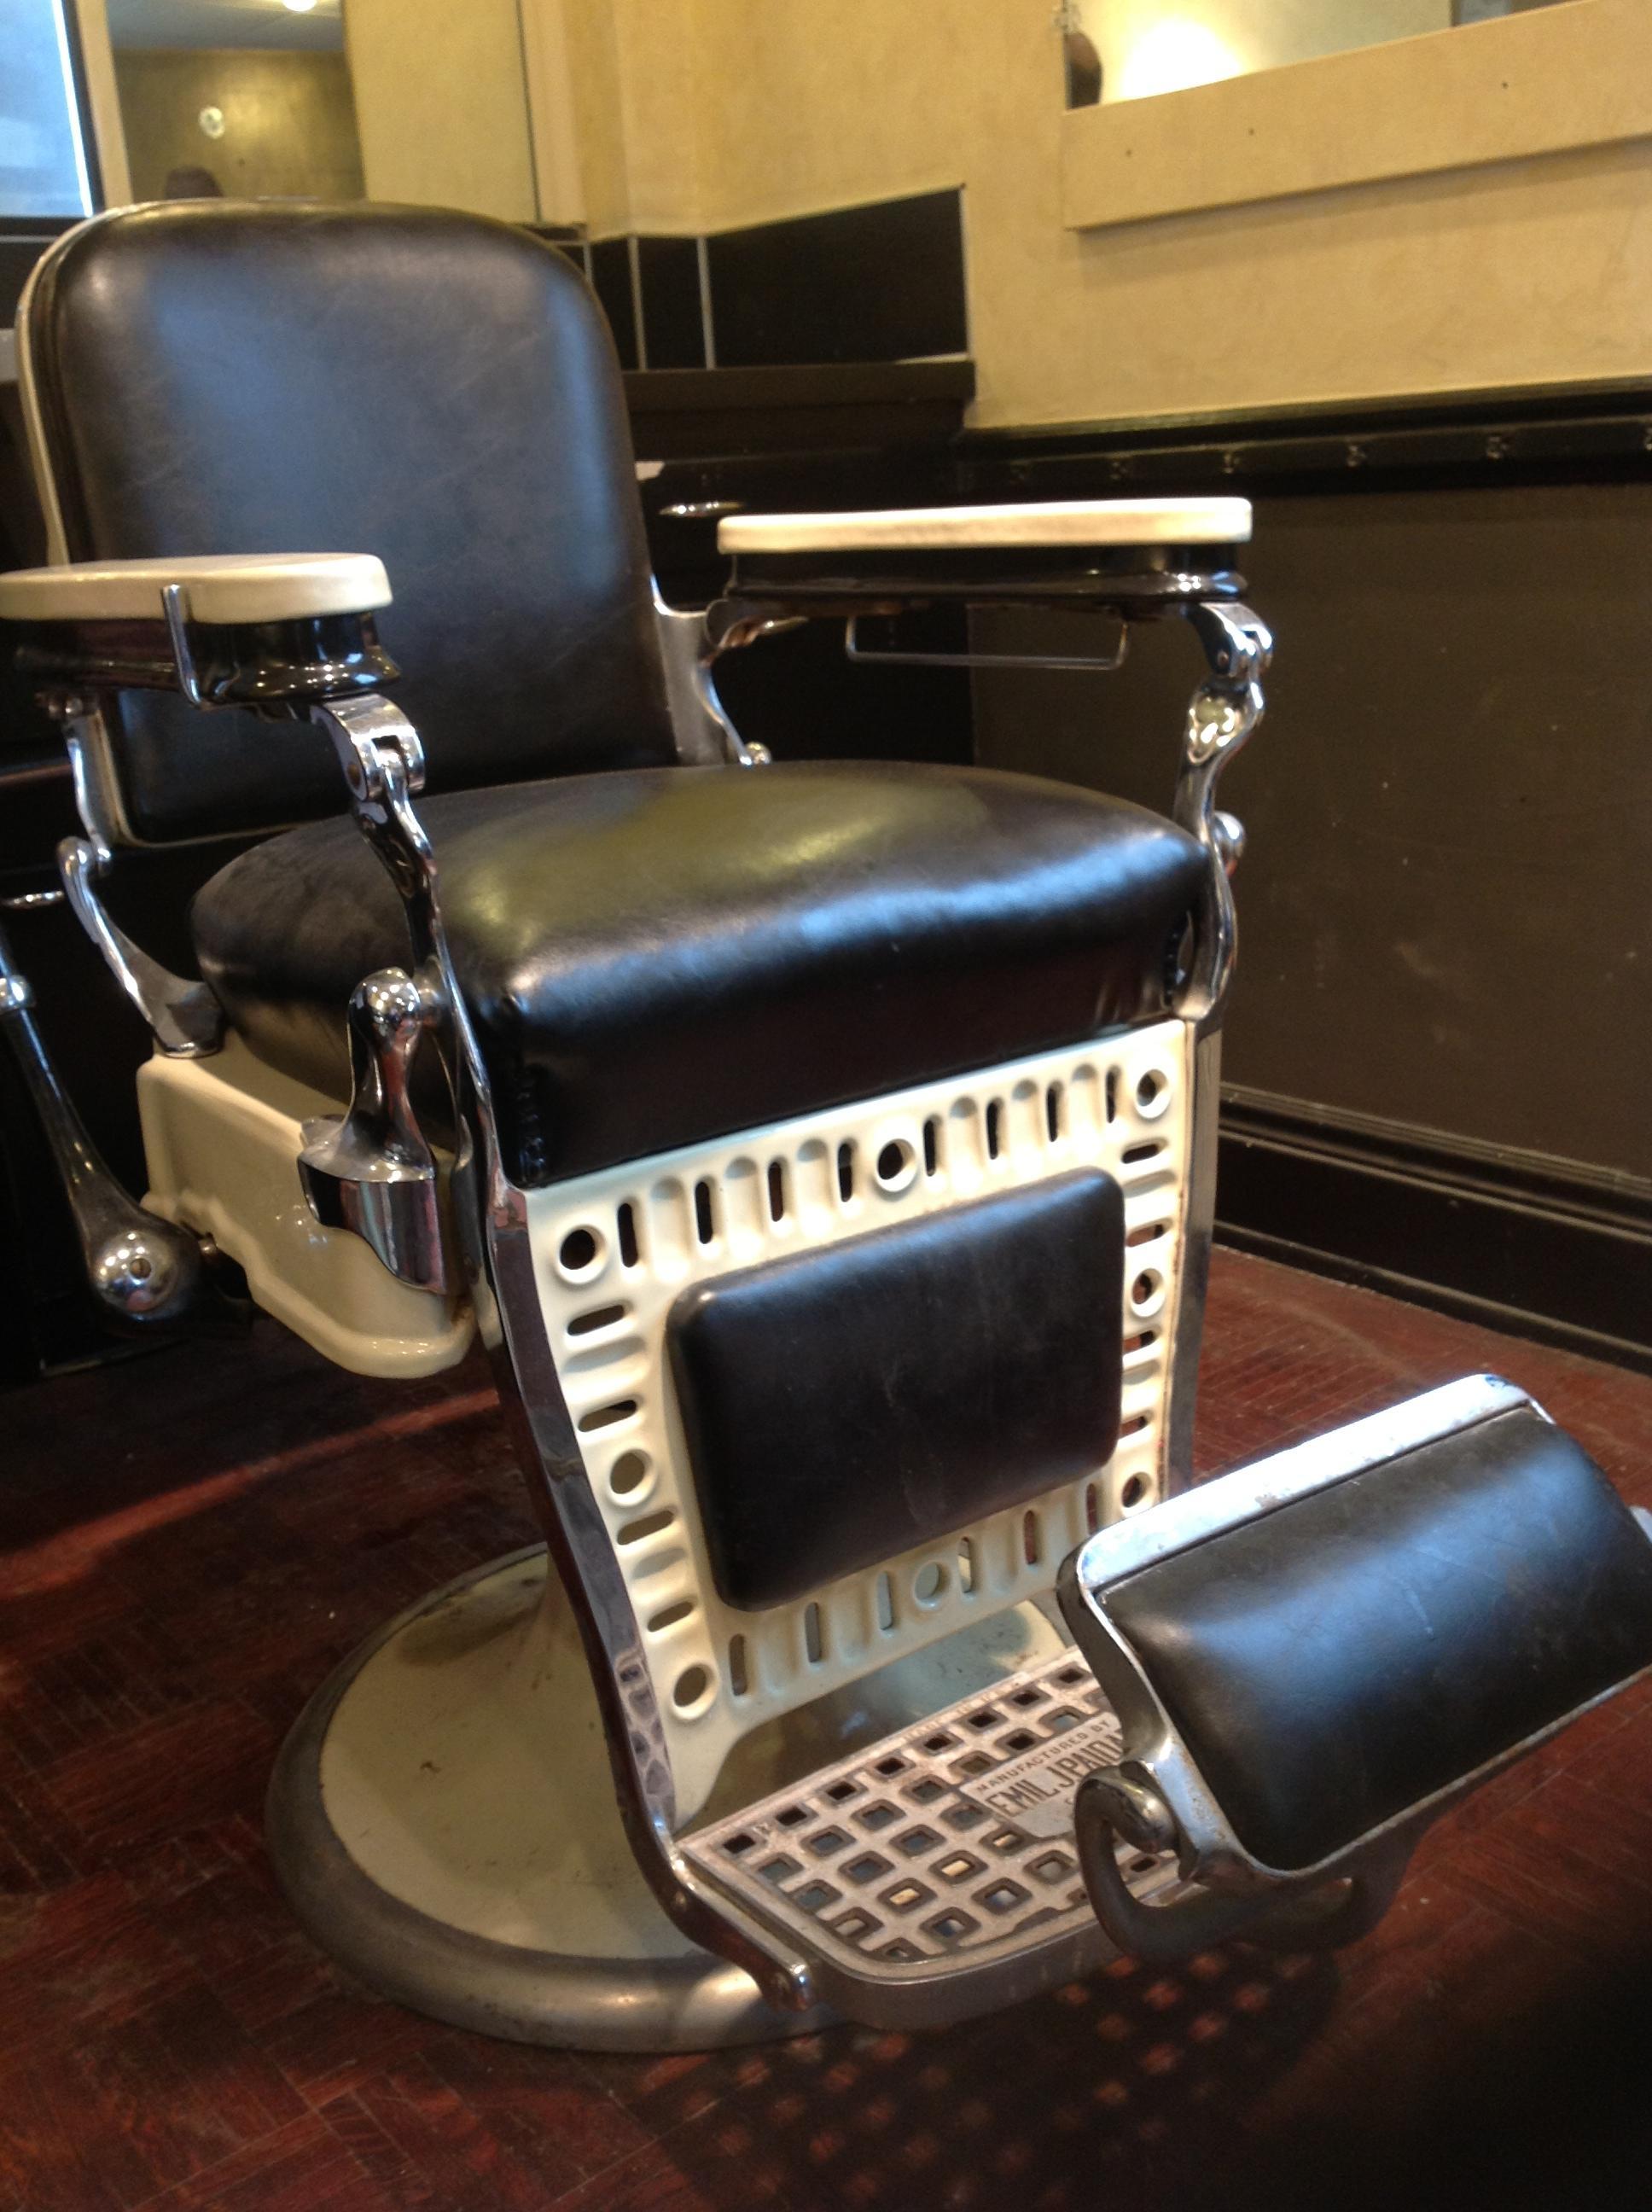 Barber chairs and falcons Hidden Kalamazoo tours the bank